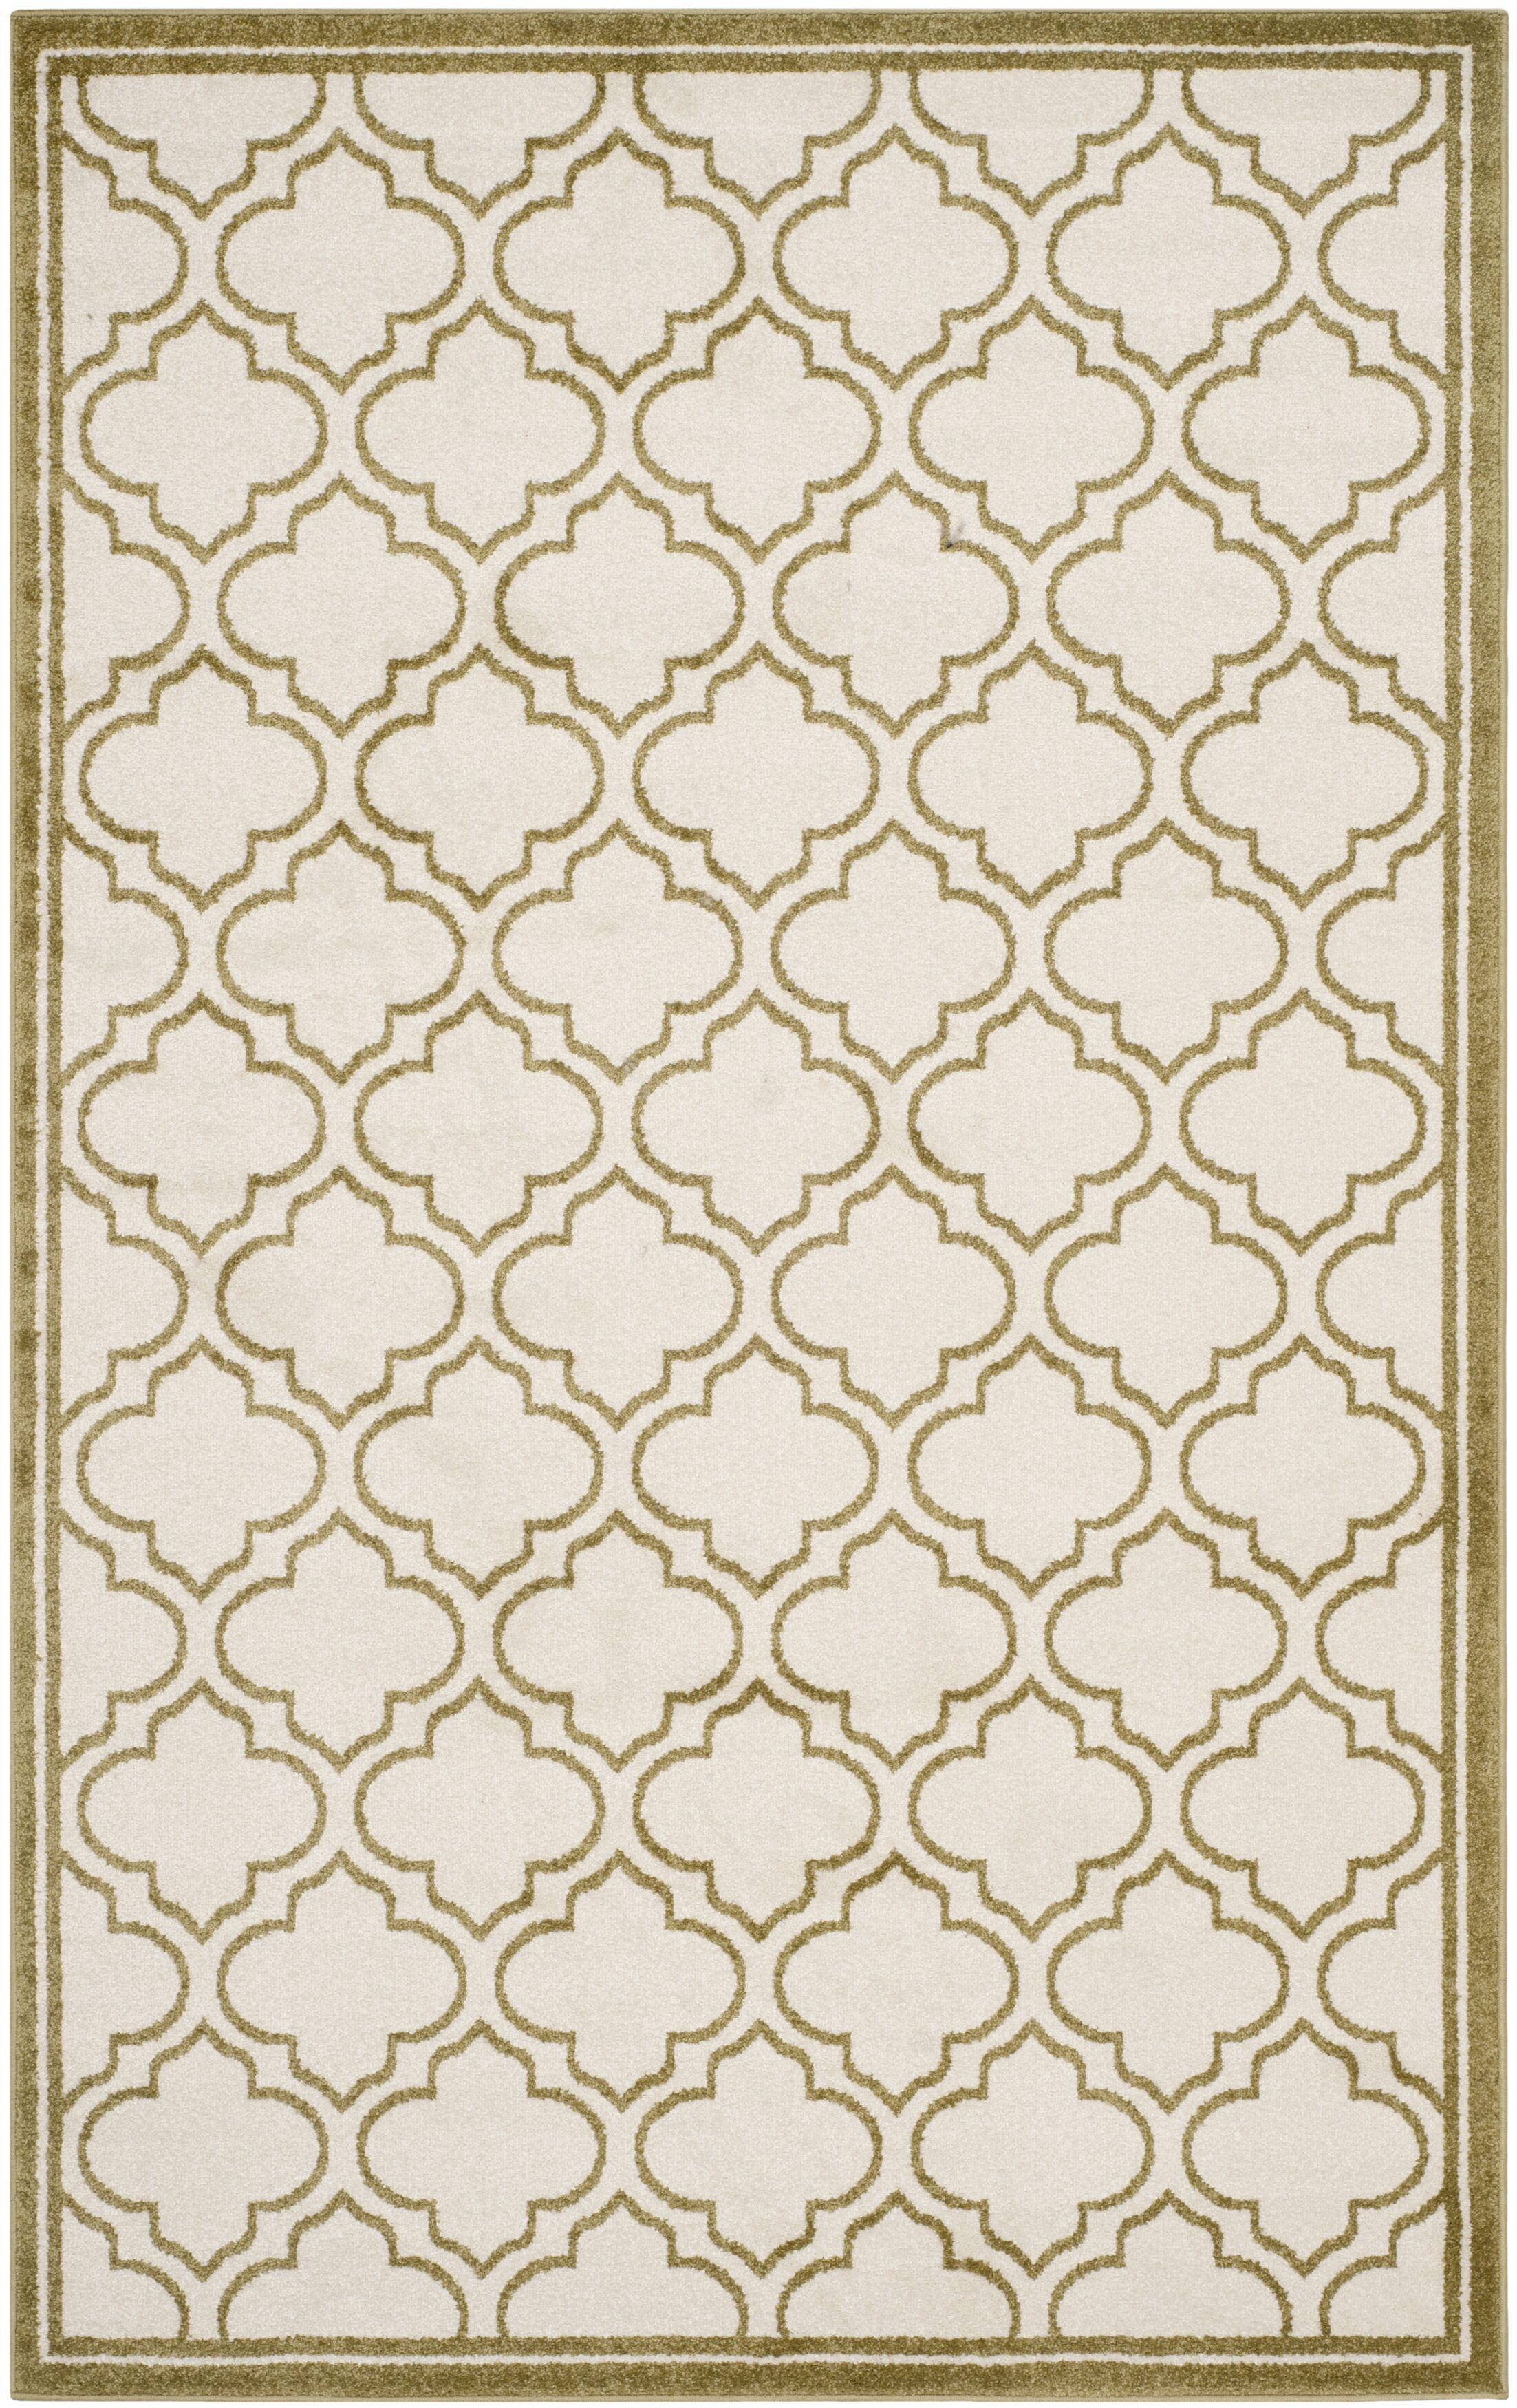 Maritza Ivory/Light Green Indoor/Outdoor Area Rug Rug Size: Rectangle 6' x 9'